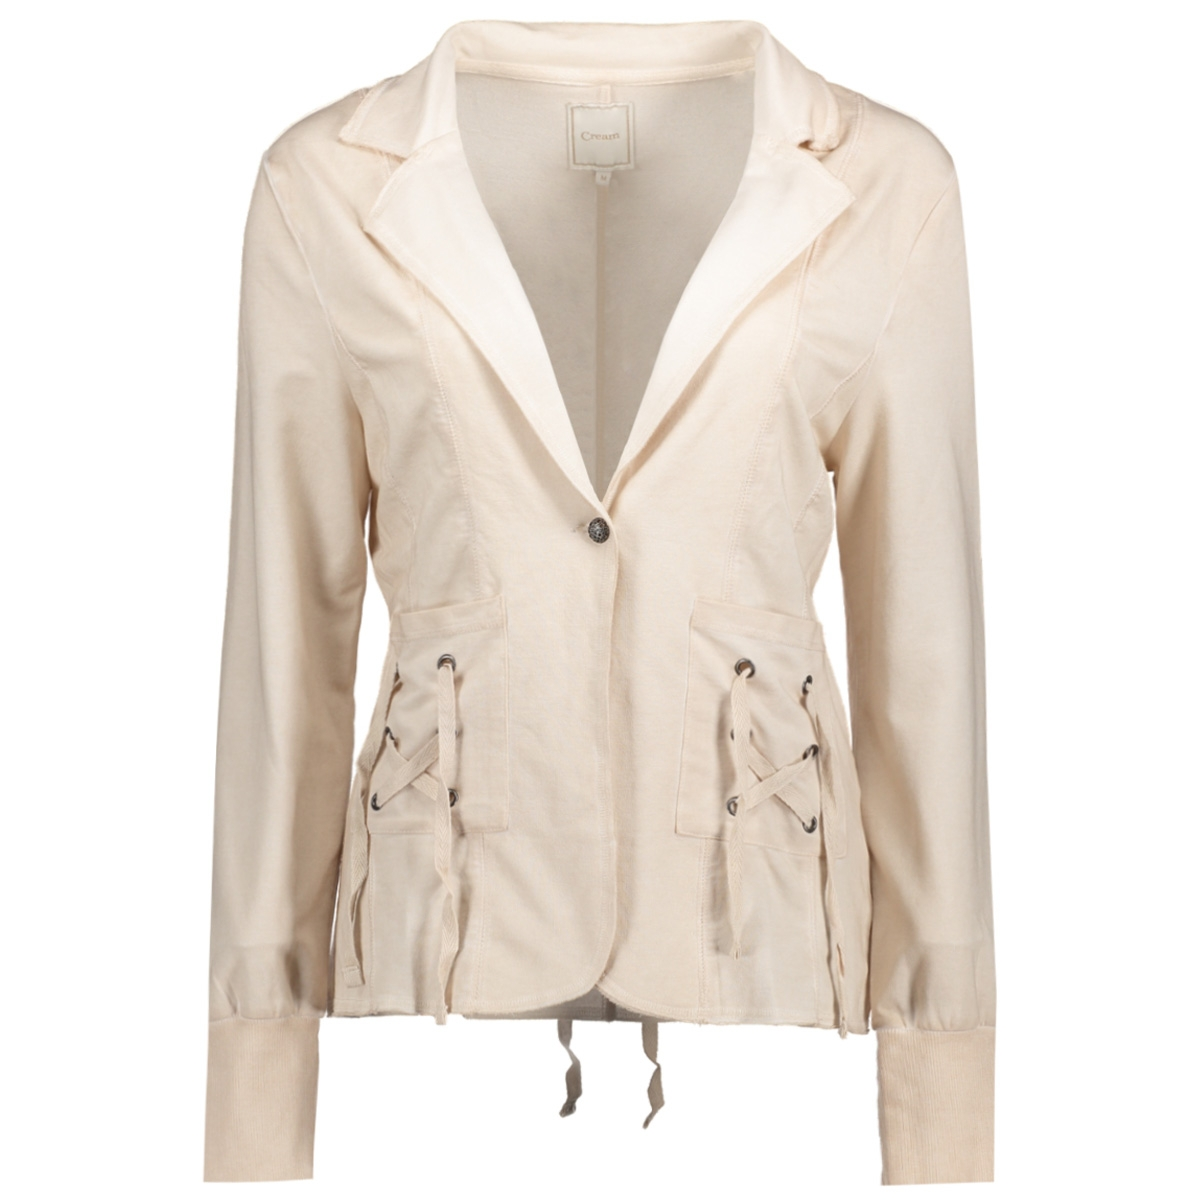 10601757 cream blazer pink tint